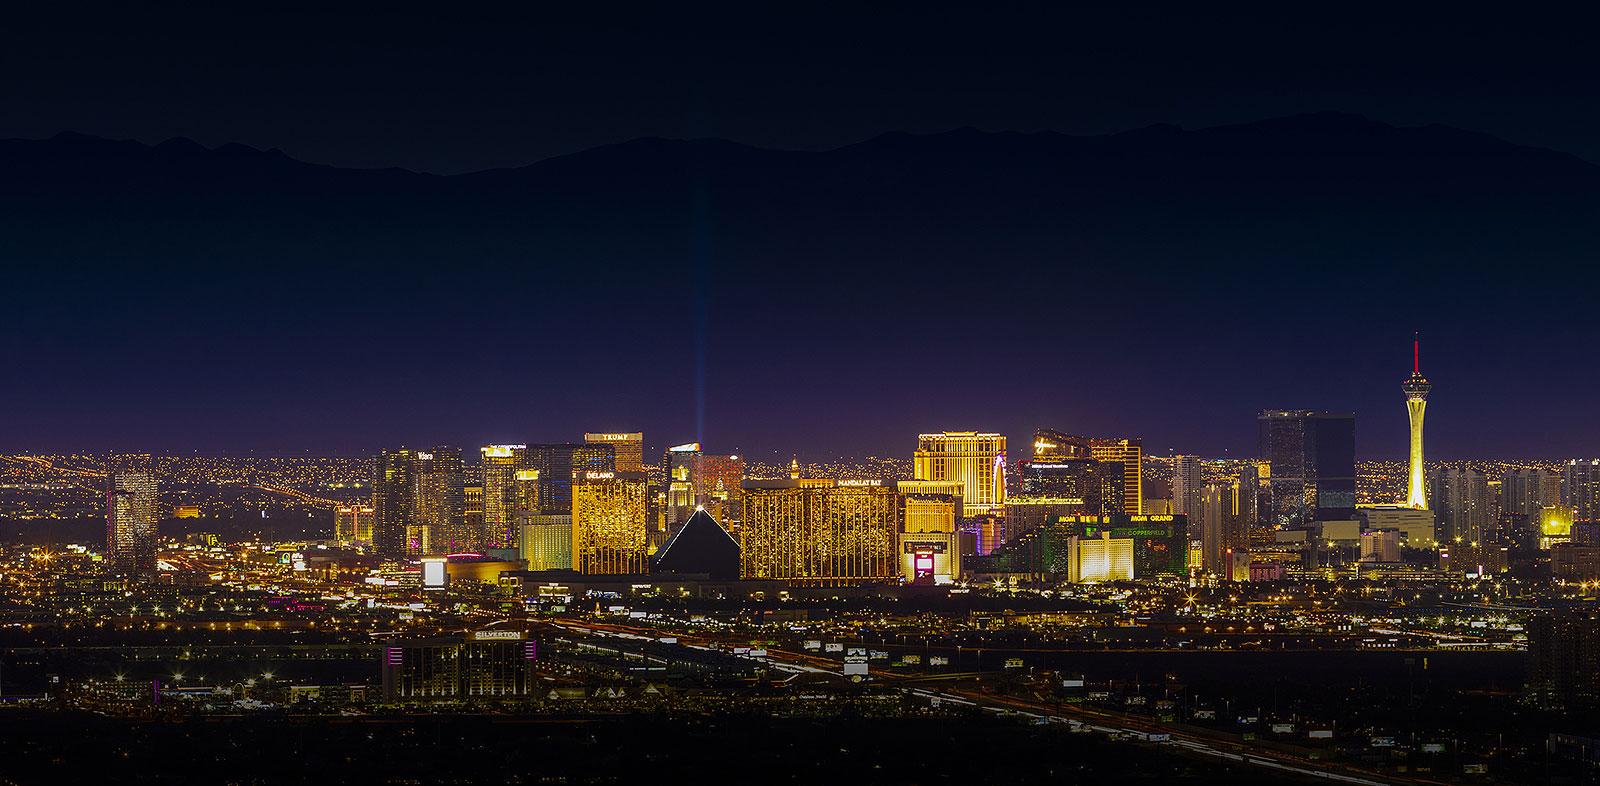 Vegas cityscape at night